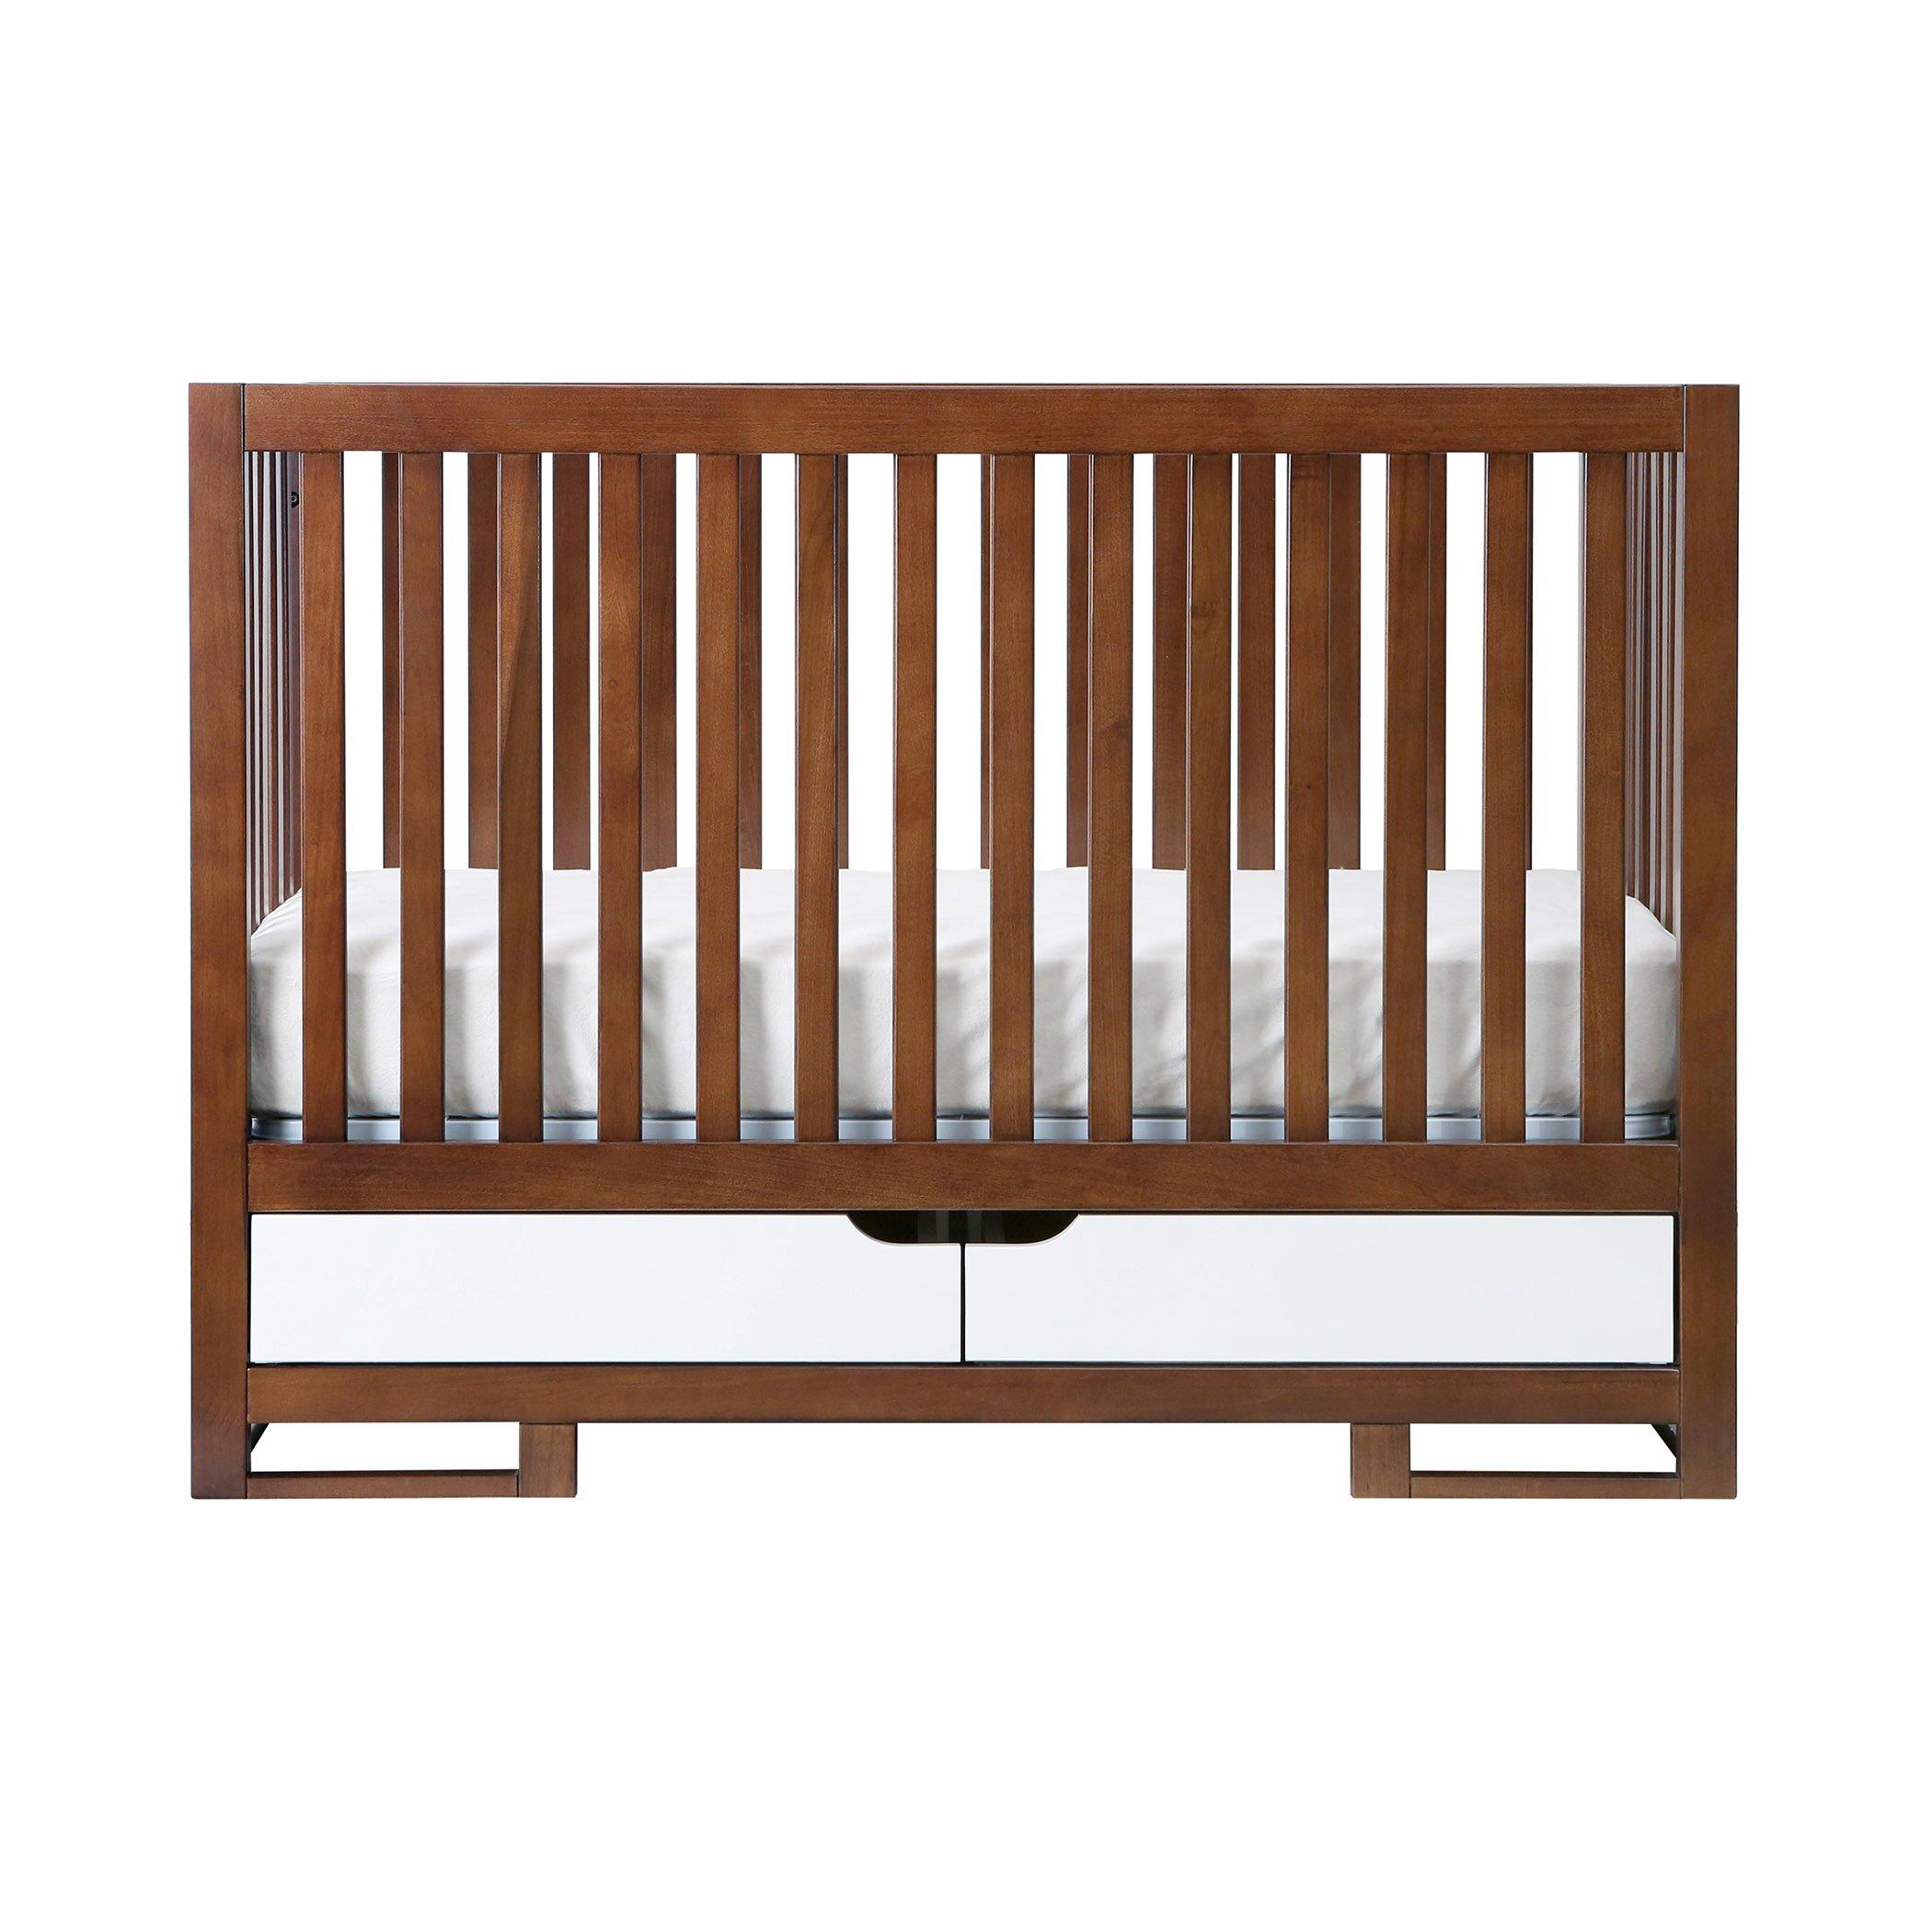 Crib for sale orlando fl - Karla Dubois Oslo 2 In 1 Convertible Crib